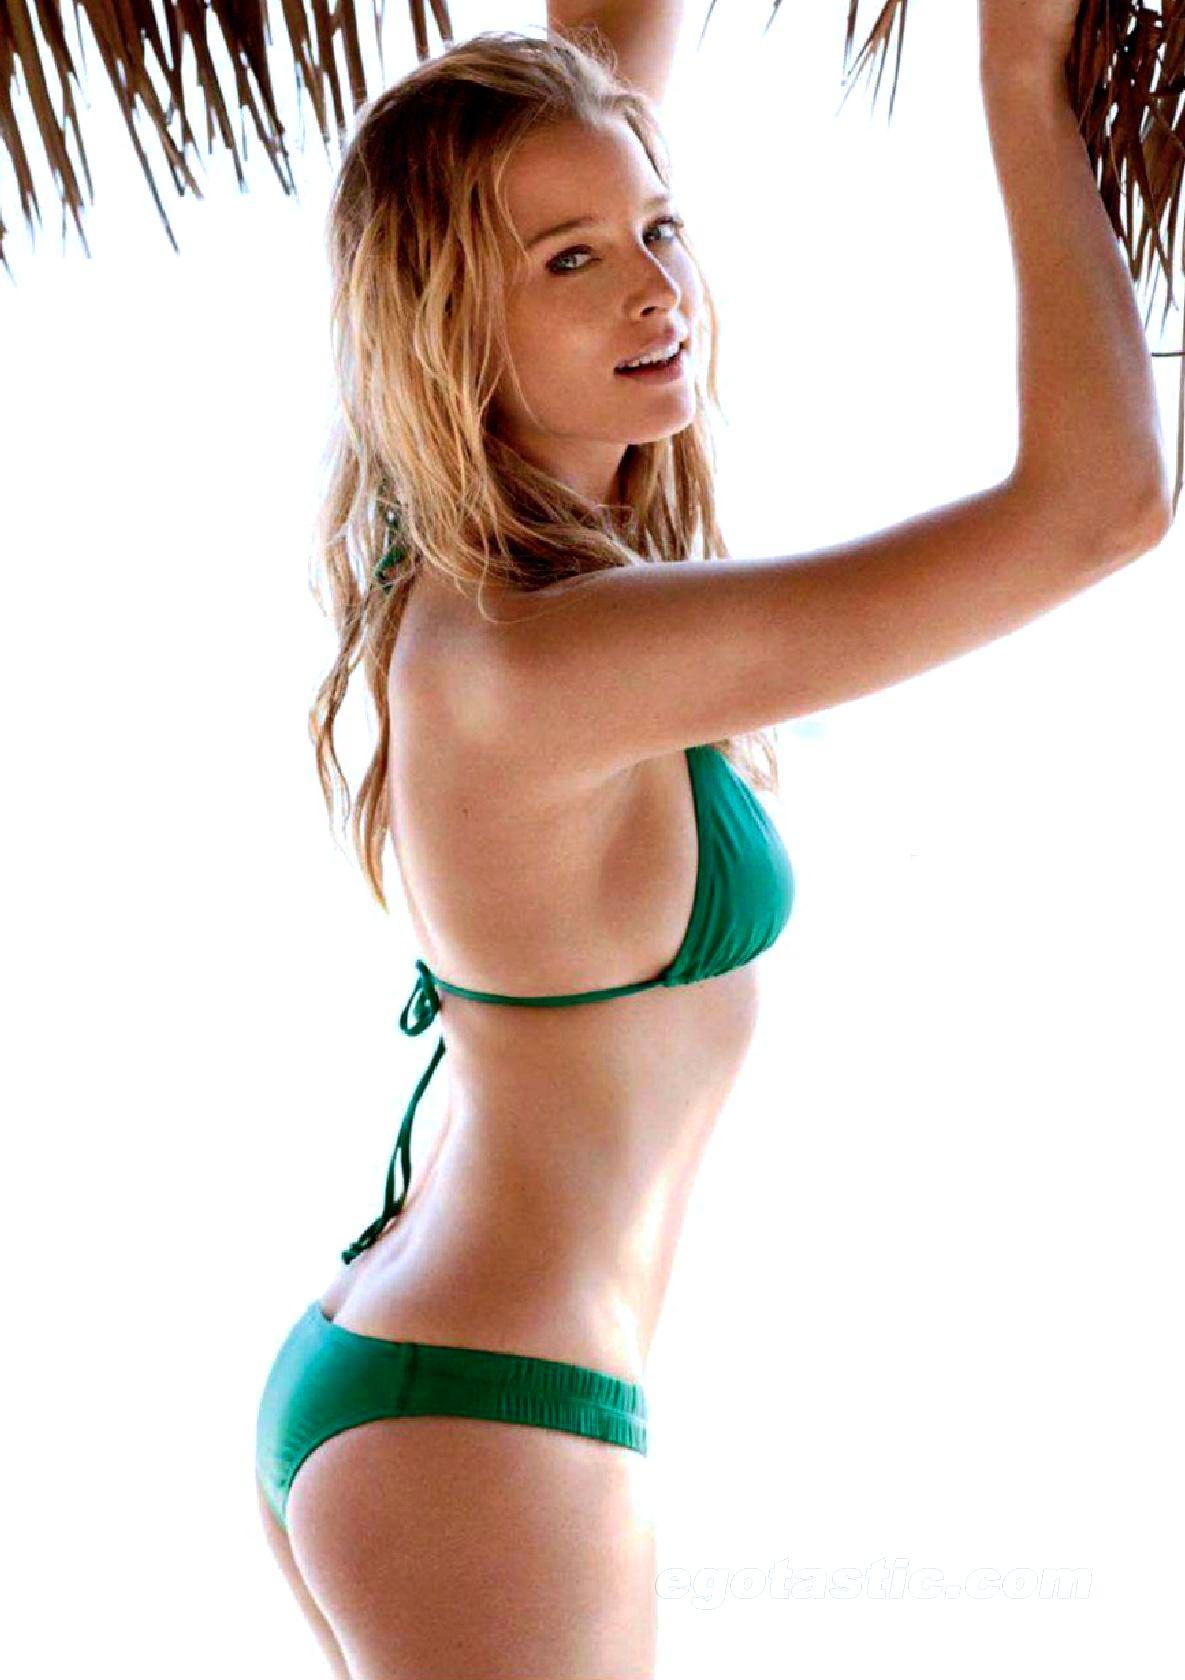 Bikini Rachel Nichols nude (78 photos), Pussy, Cleavage, Twitter, cameltoe 2017